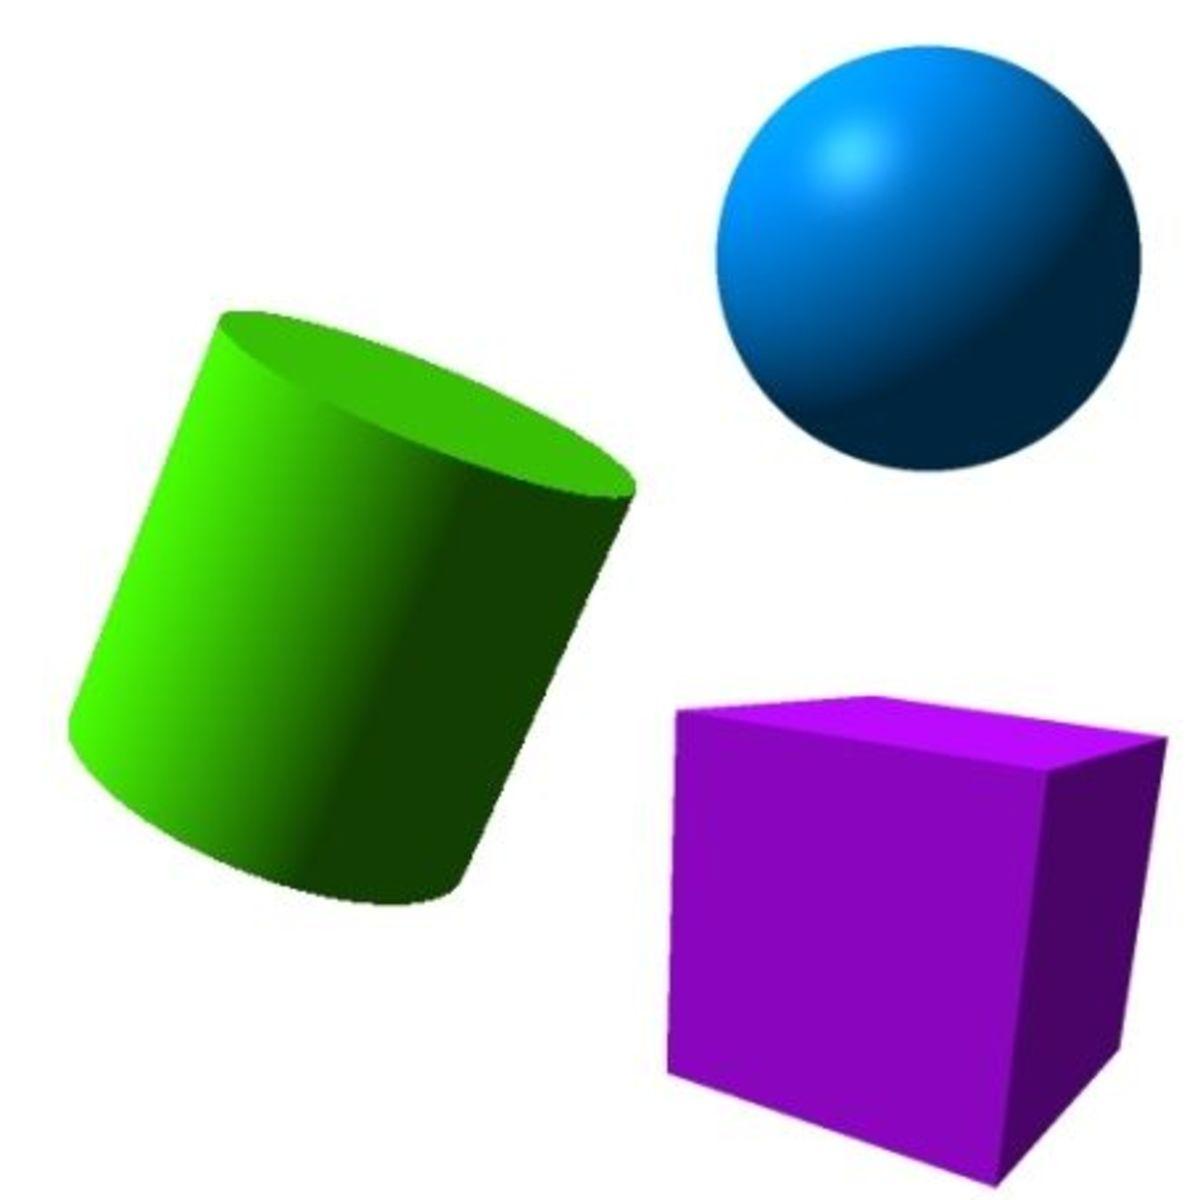 Printable 3D Shape Games